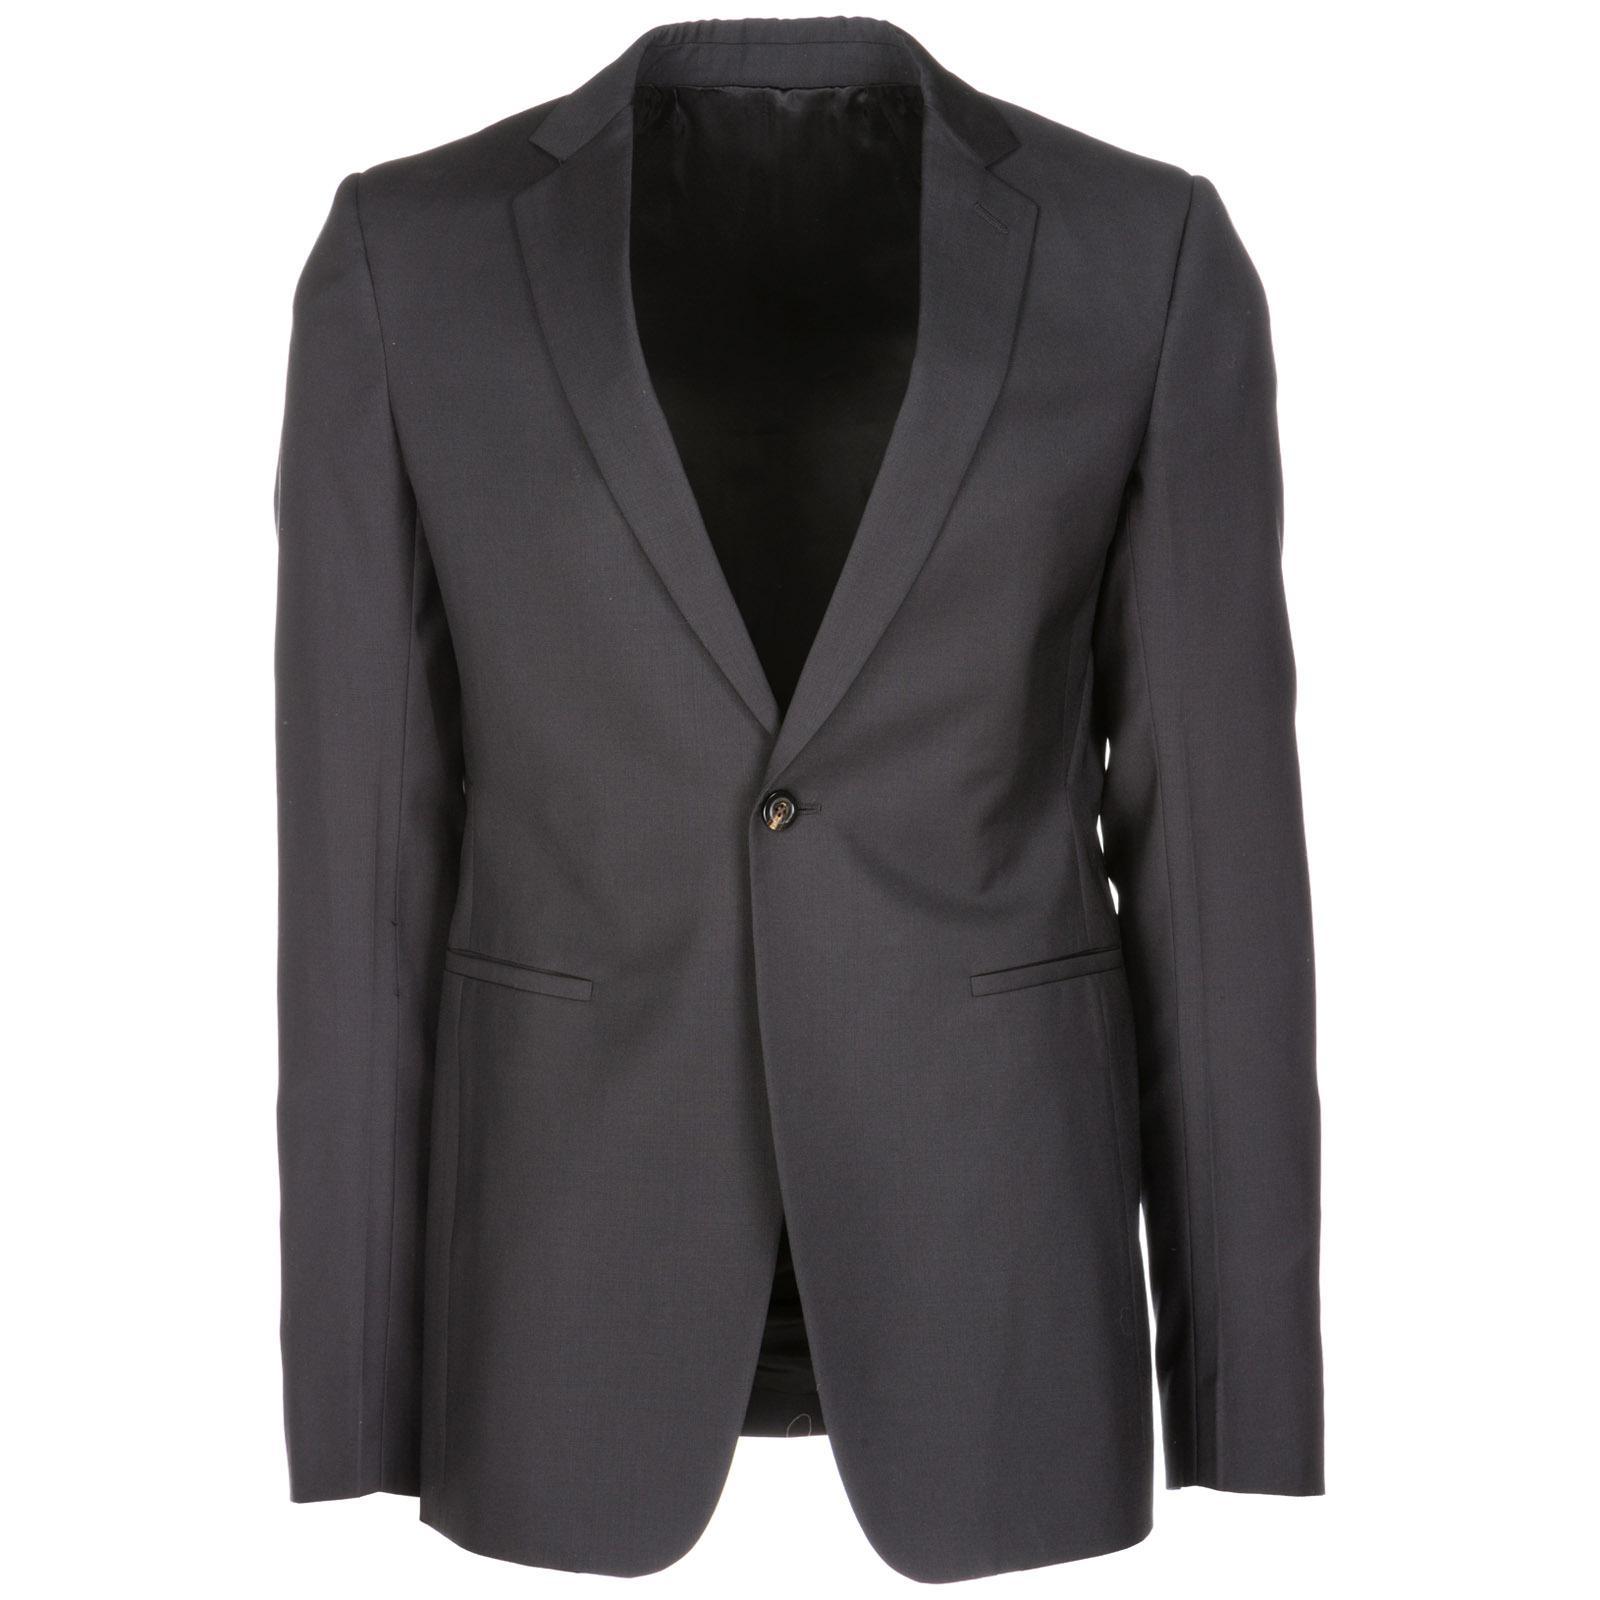 Rick Owens Men's Jacket Blazer In Black